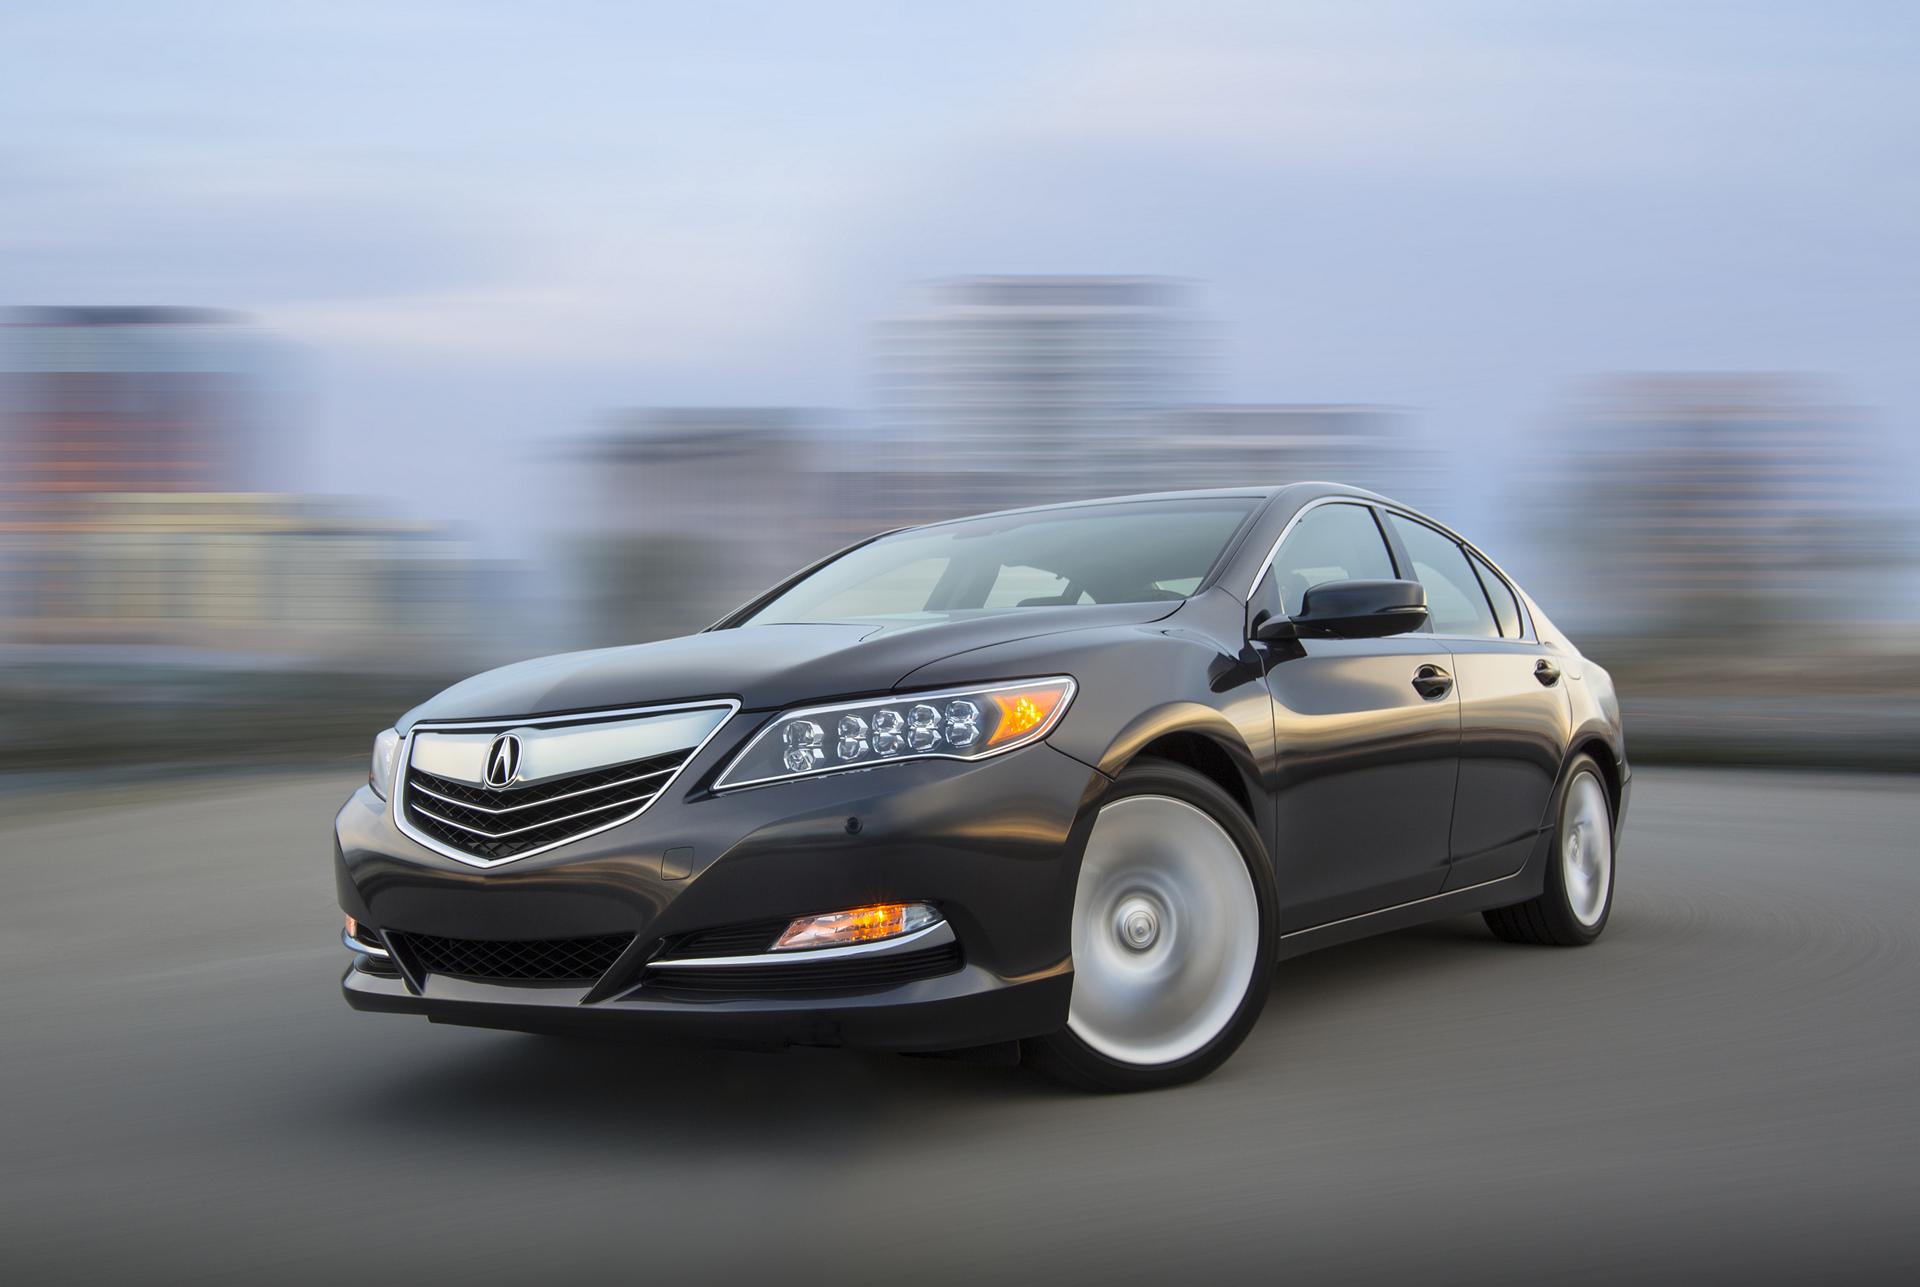 2017 Acura RLX © Honda Motor Co., Ltd.